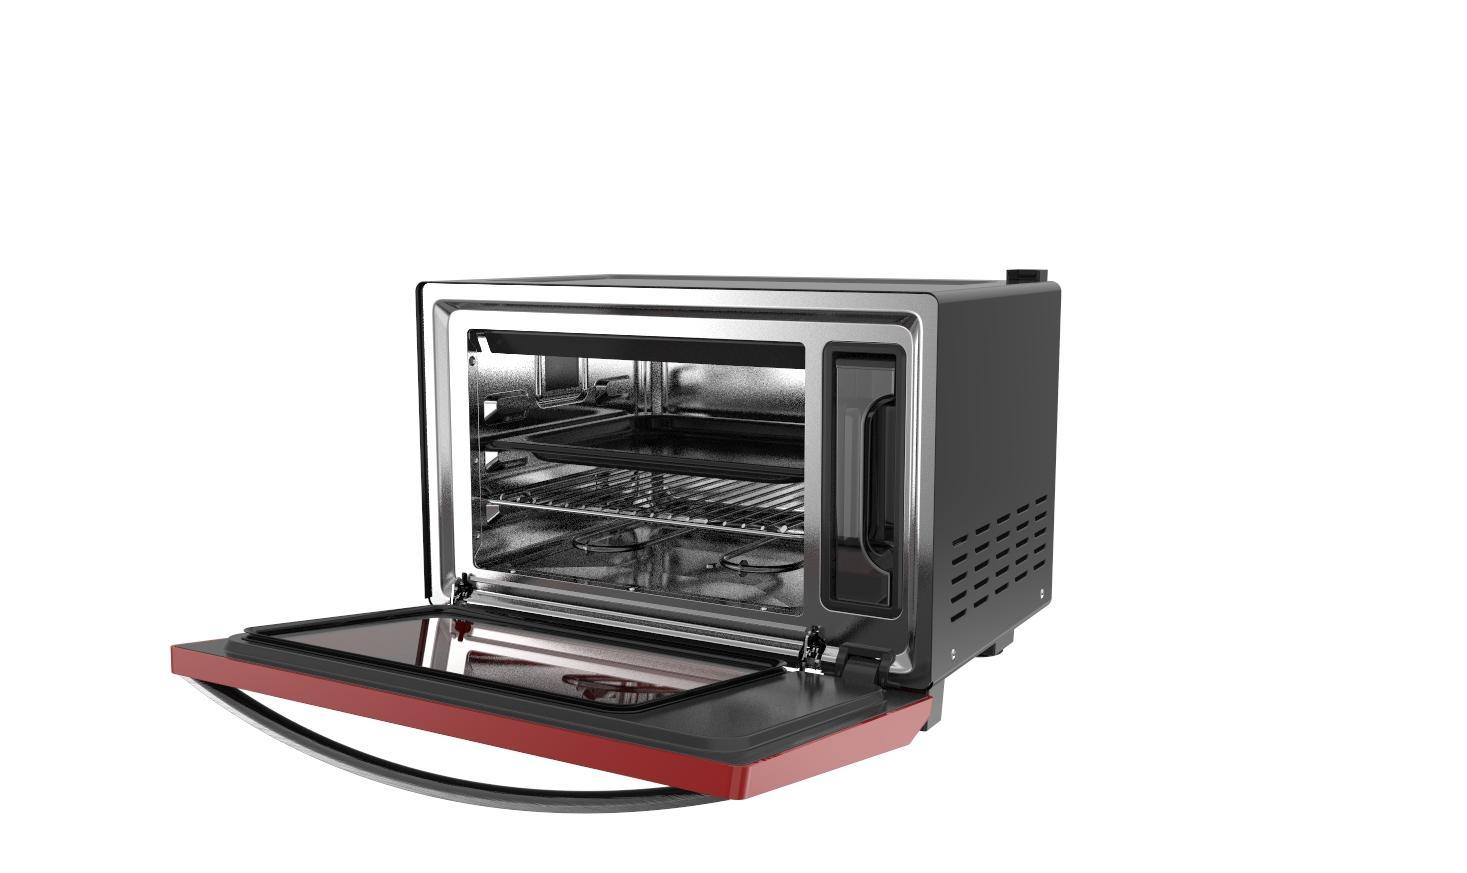 25L knob/ touch screen desktop steam oven 4